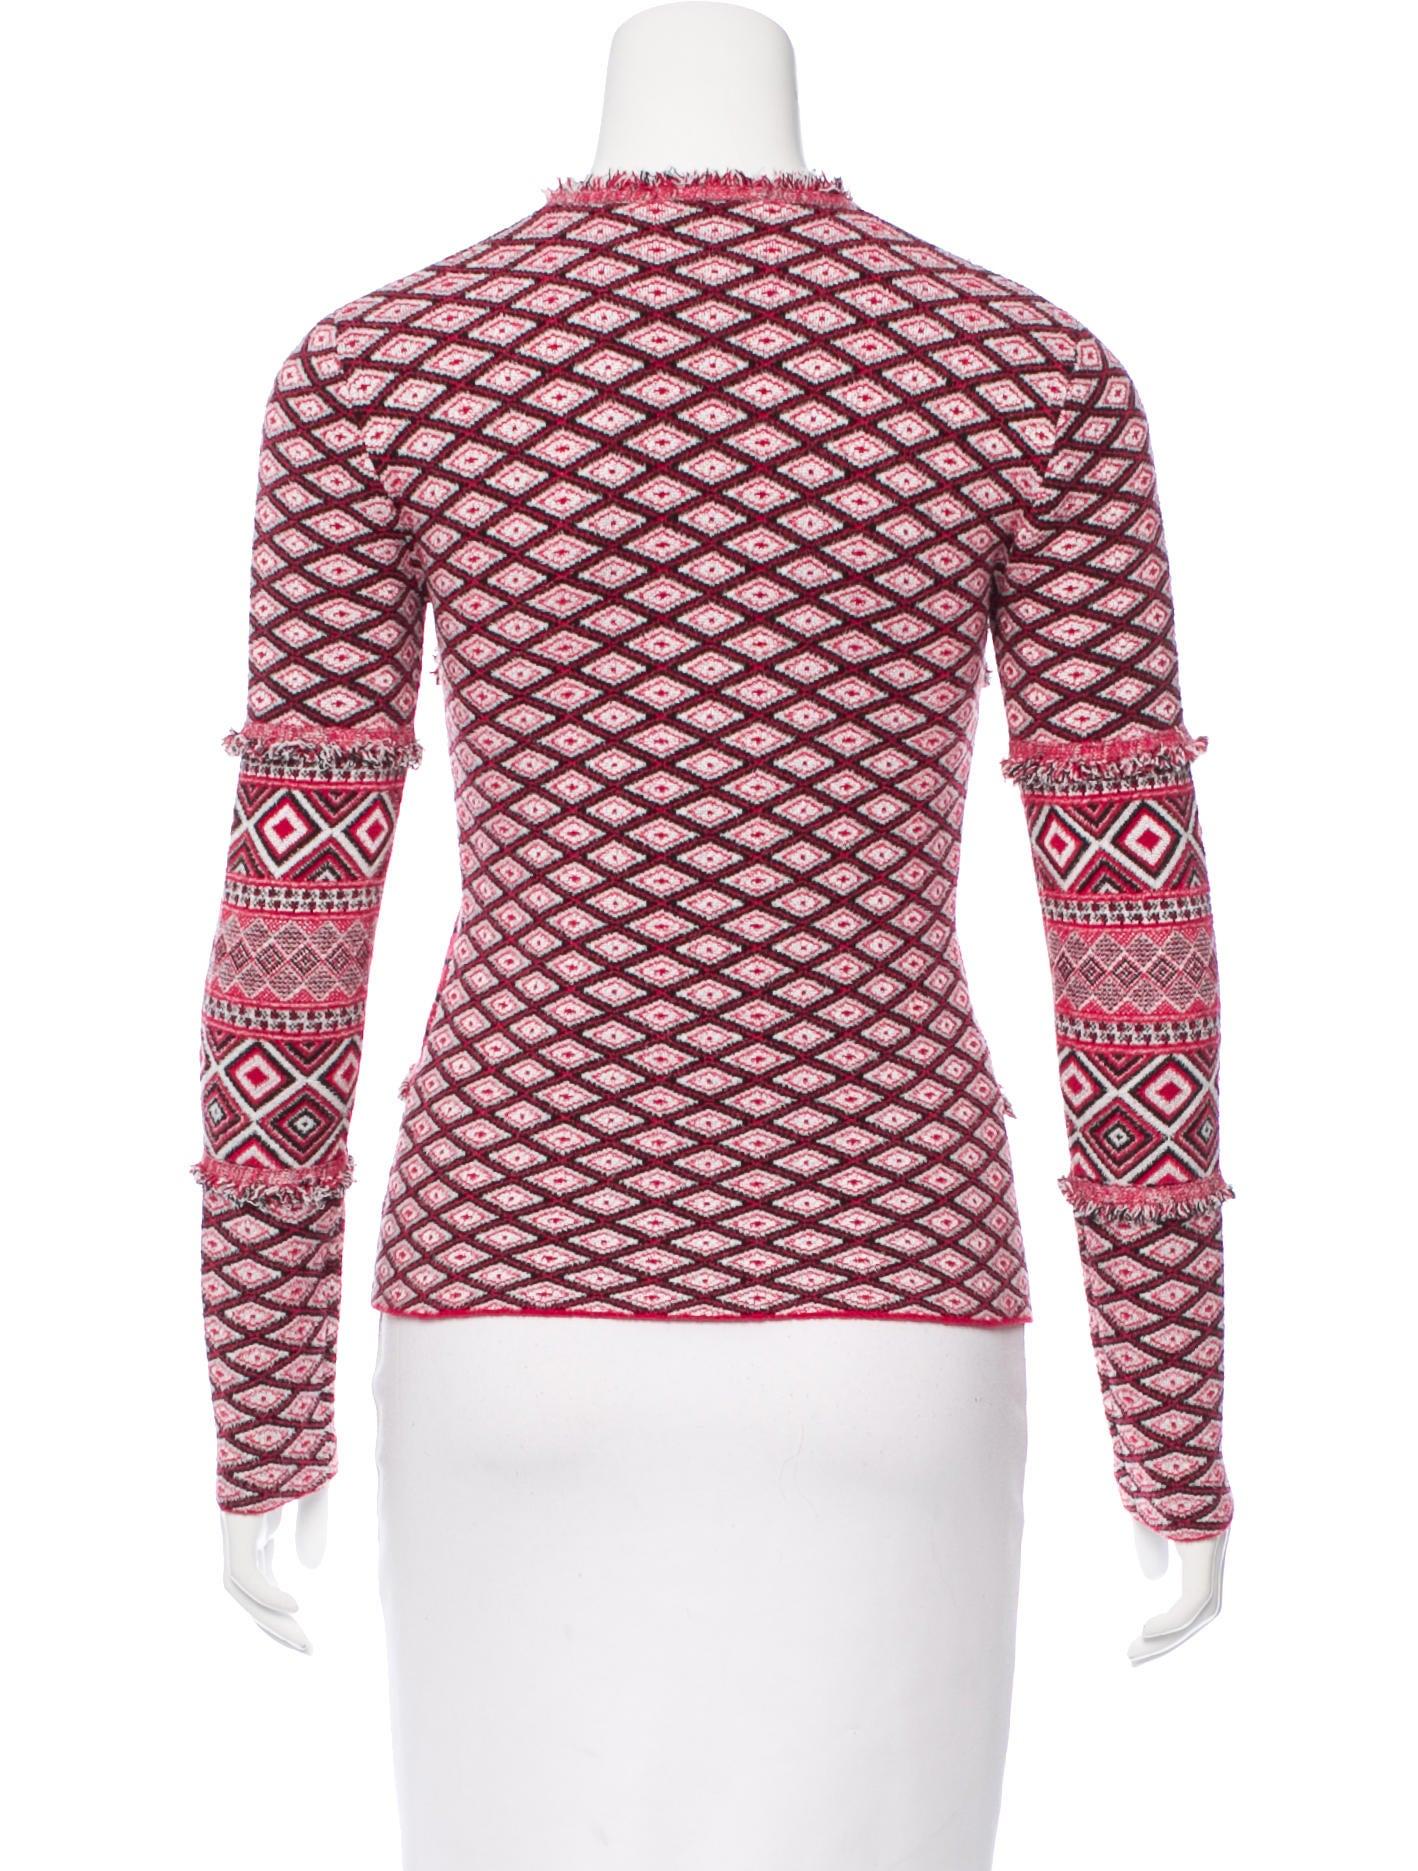 Altuzarra Rey Jacquard Sweater - Clothing